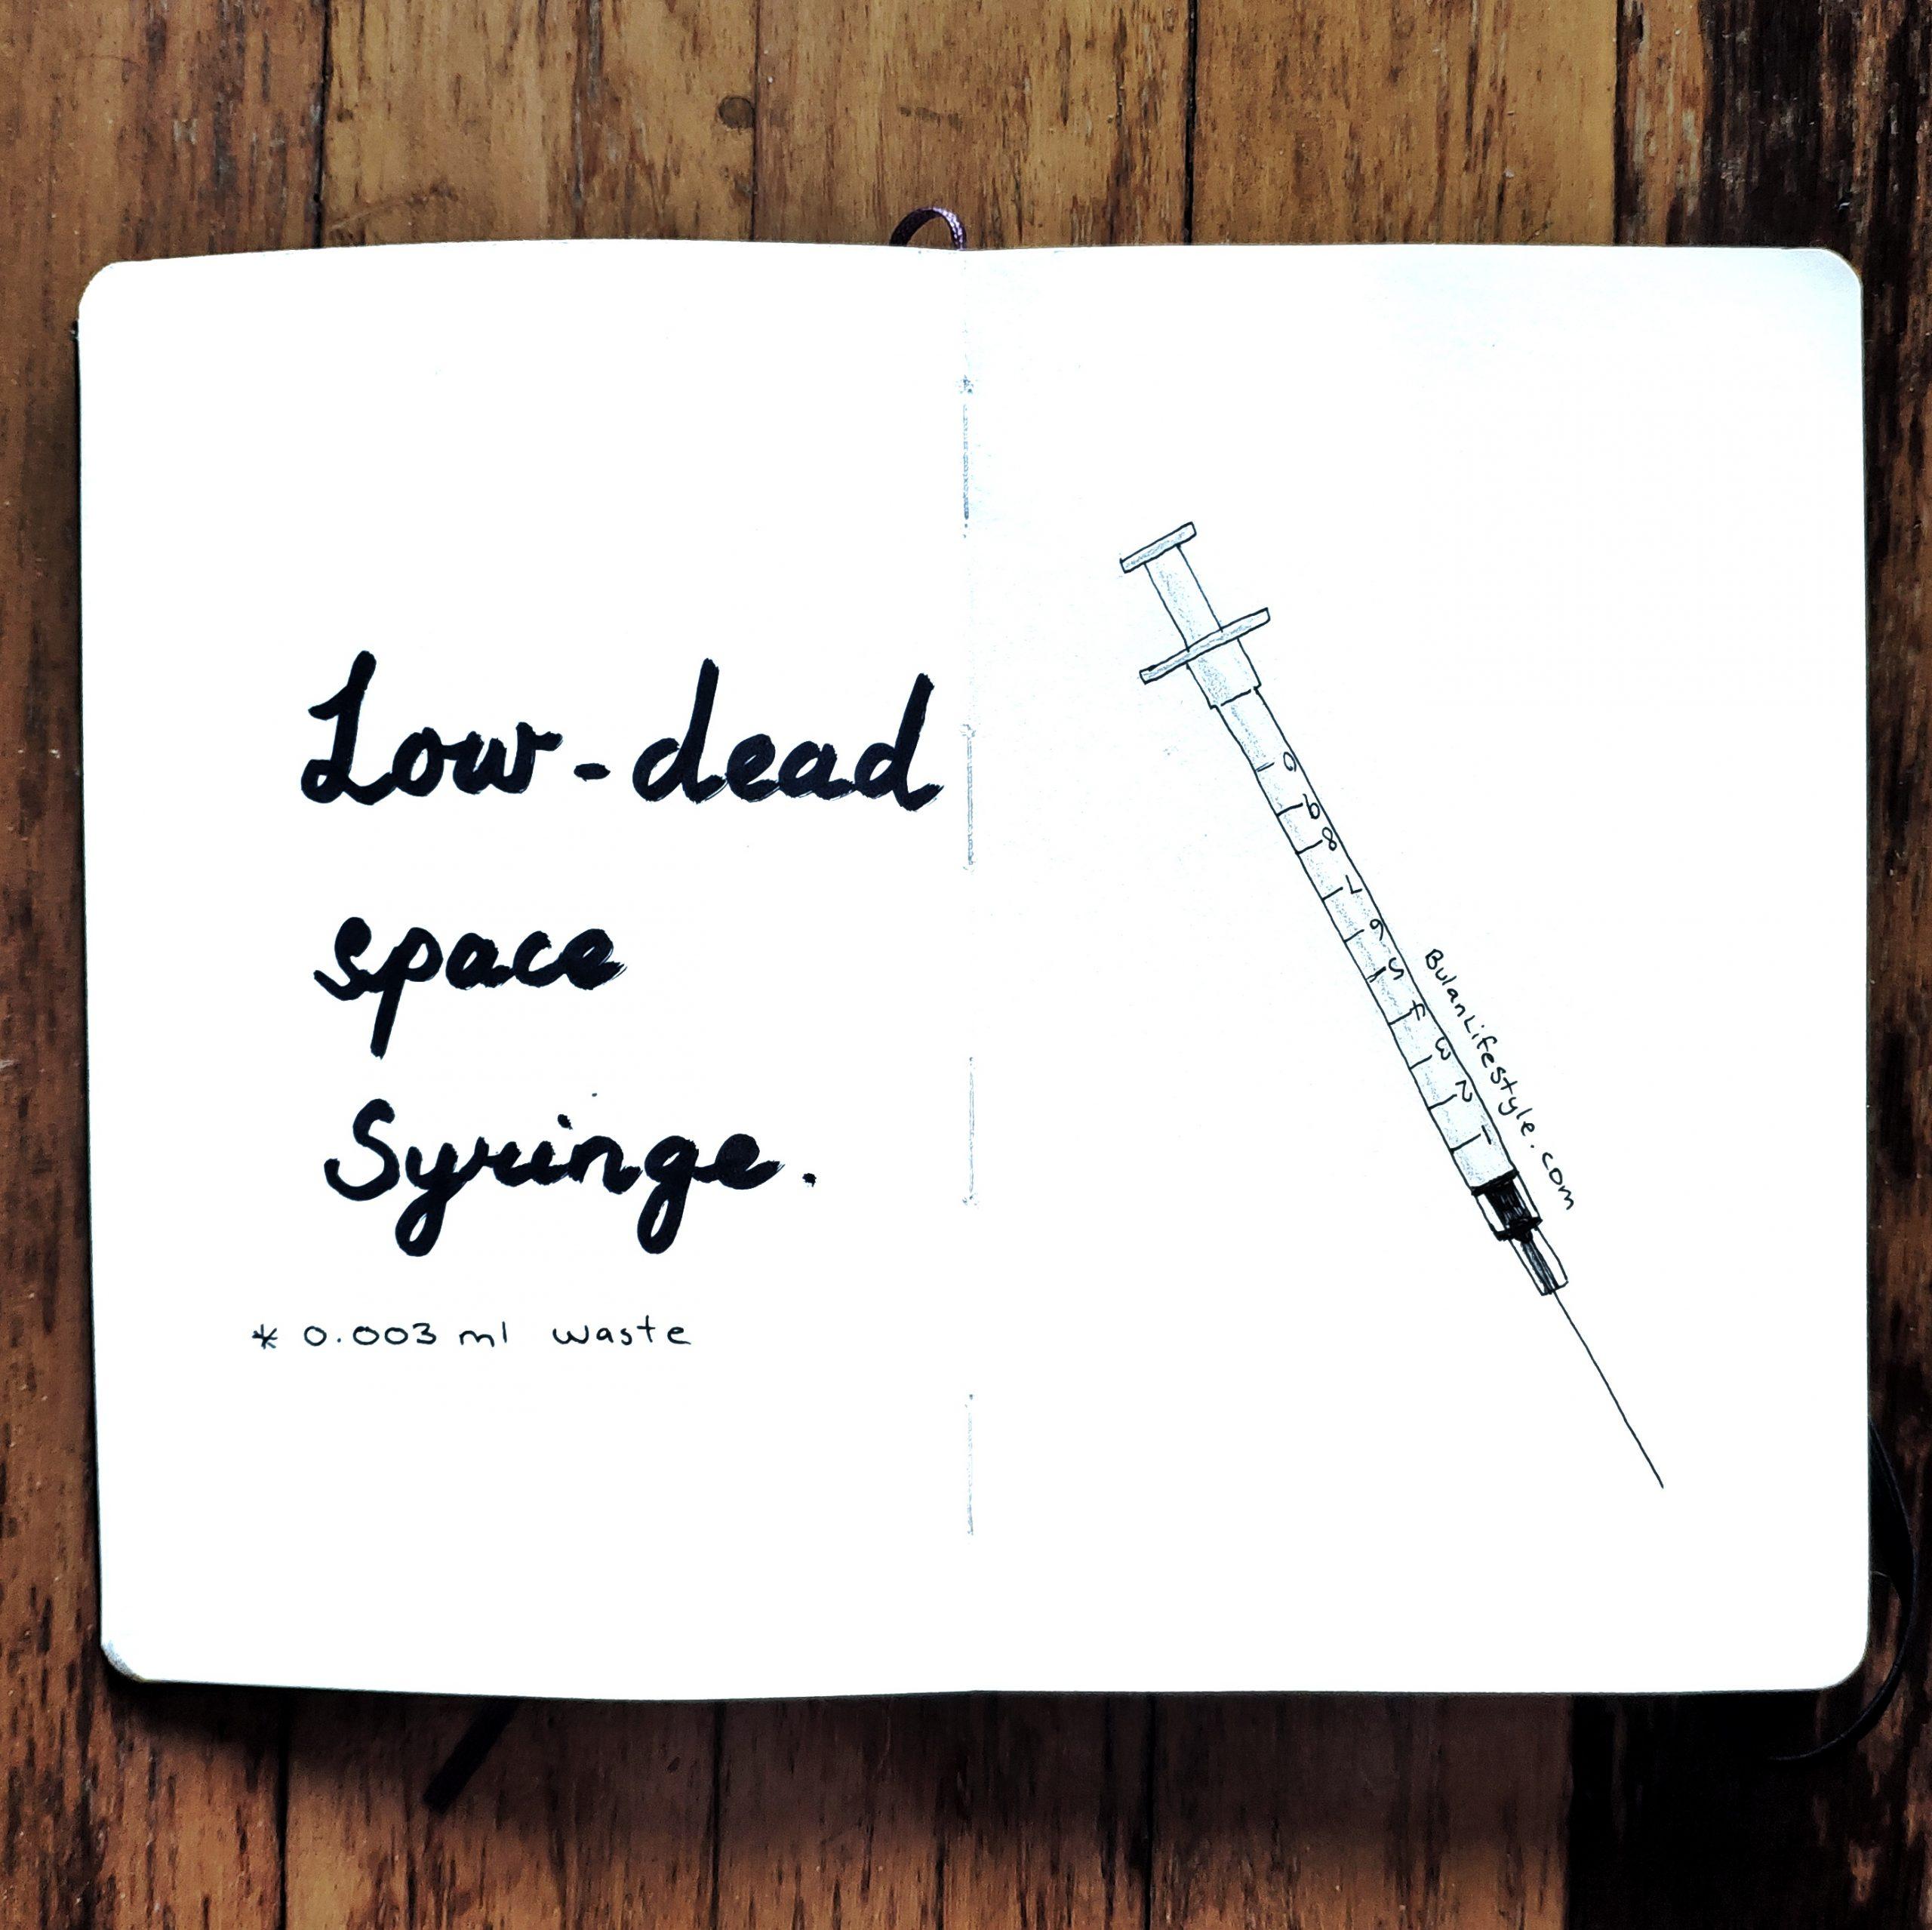 Low dead space syringe